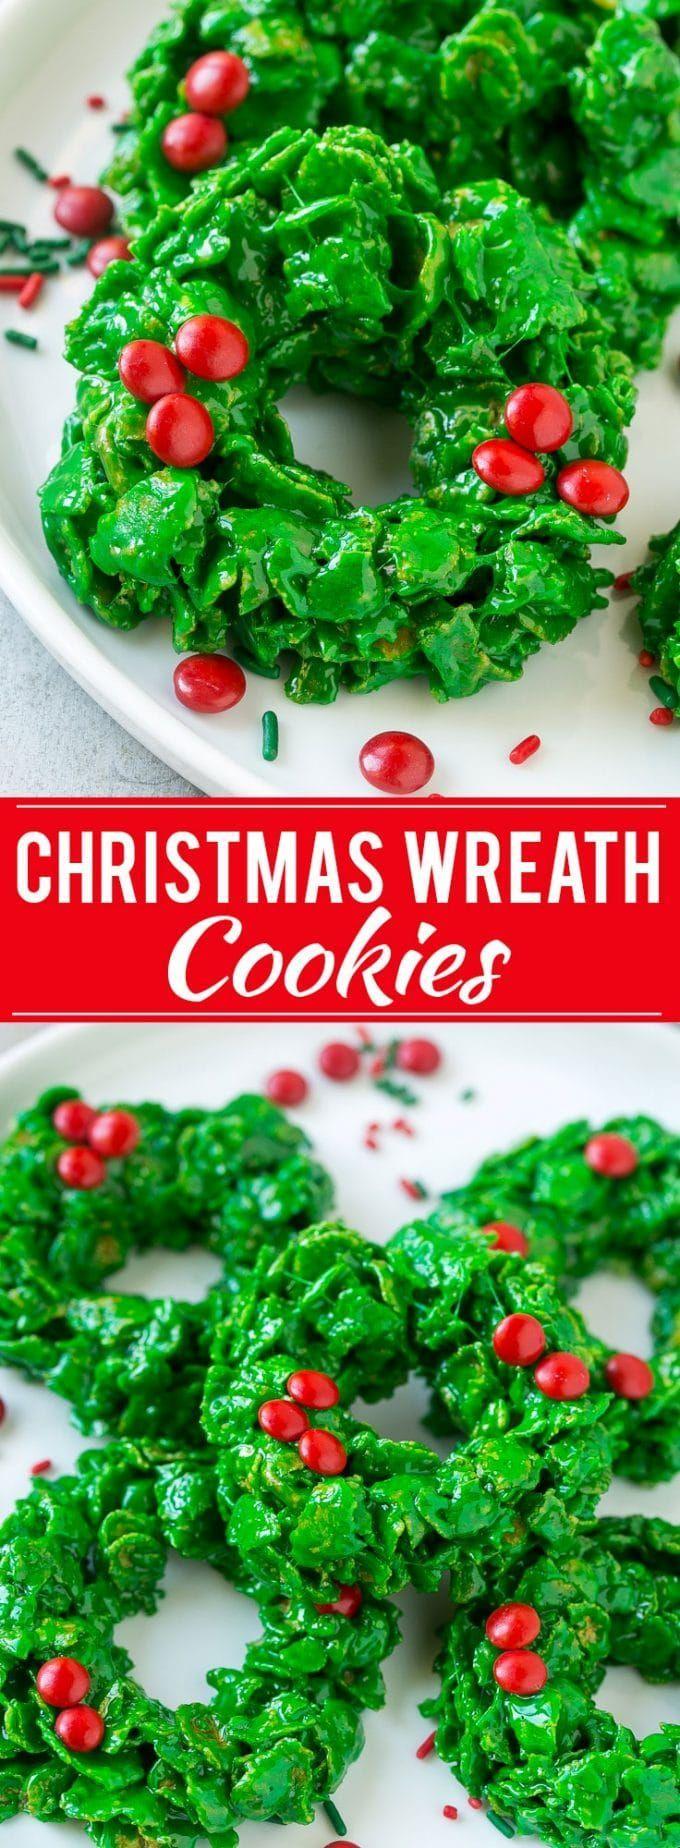 Christmas Wreath Cookies Recipe | Christmas Cookie Recipe | Easy Cookie Recipe | No Bake Cookie Recipe